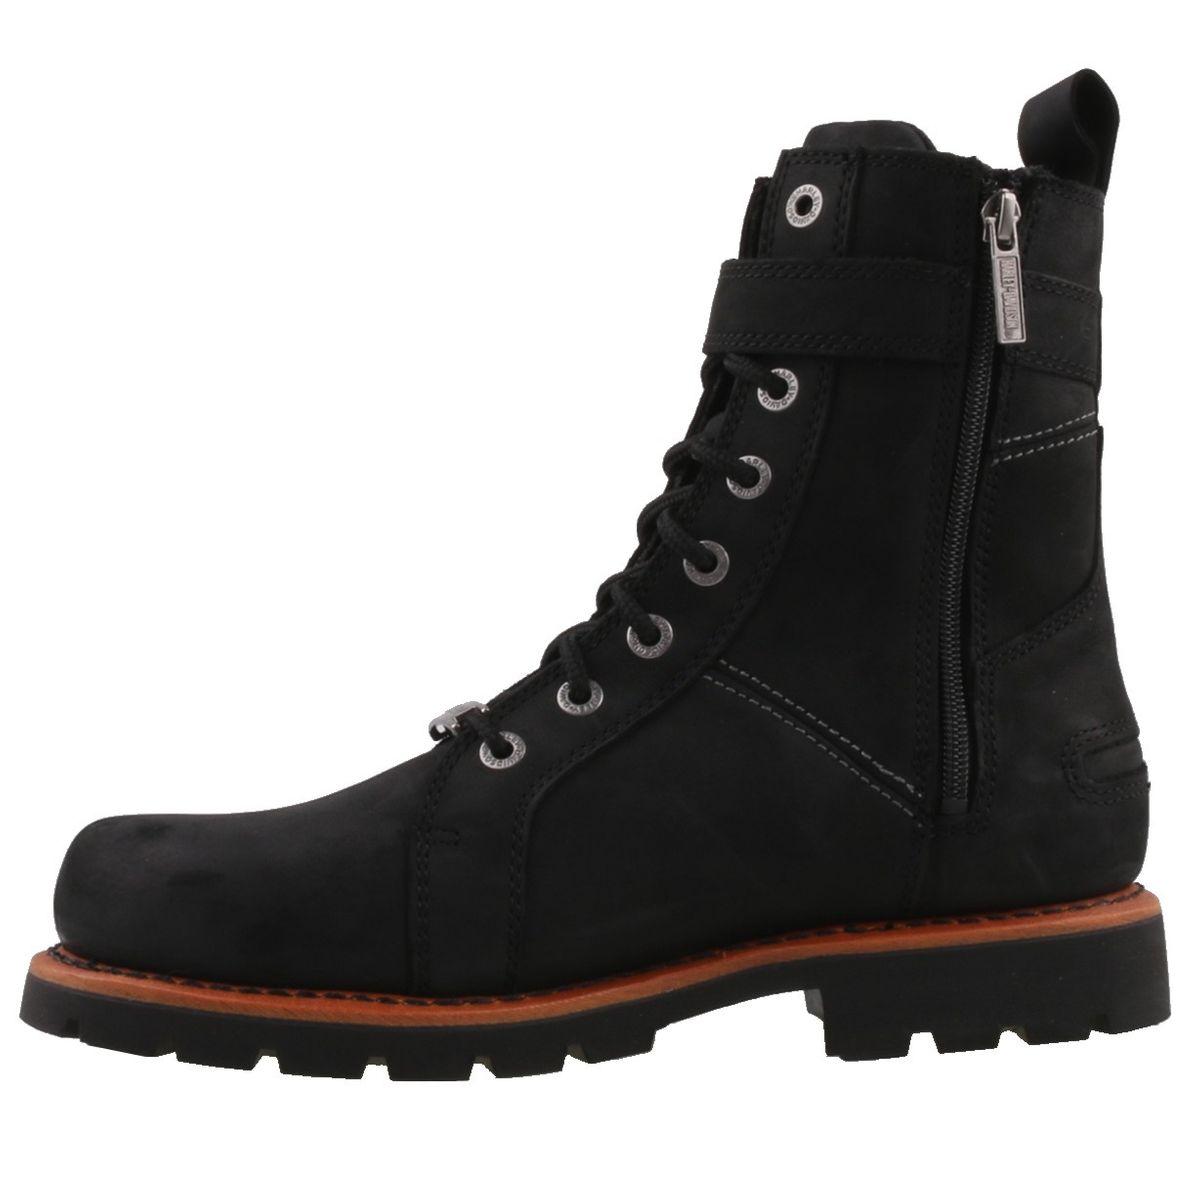 neu harley davidson herrenschuhe schuhe stiefel boots. Black Bedroom Furniture Sets. Home Design Ideas